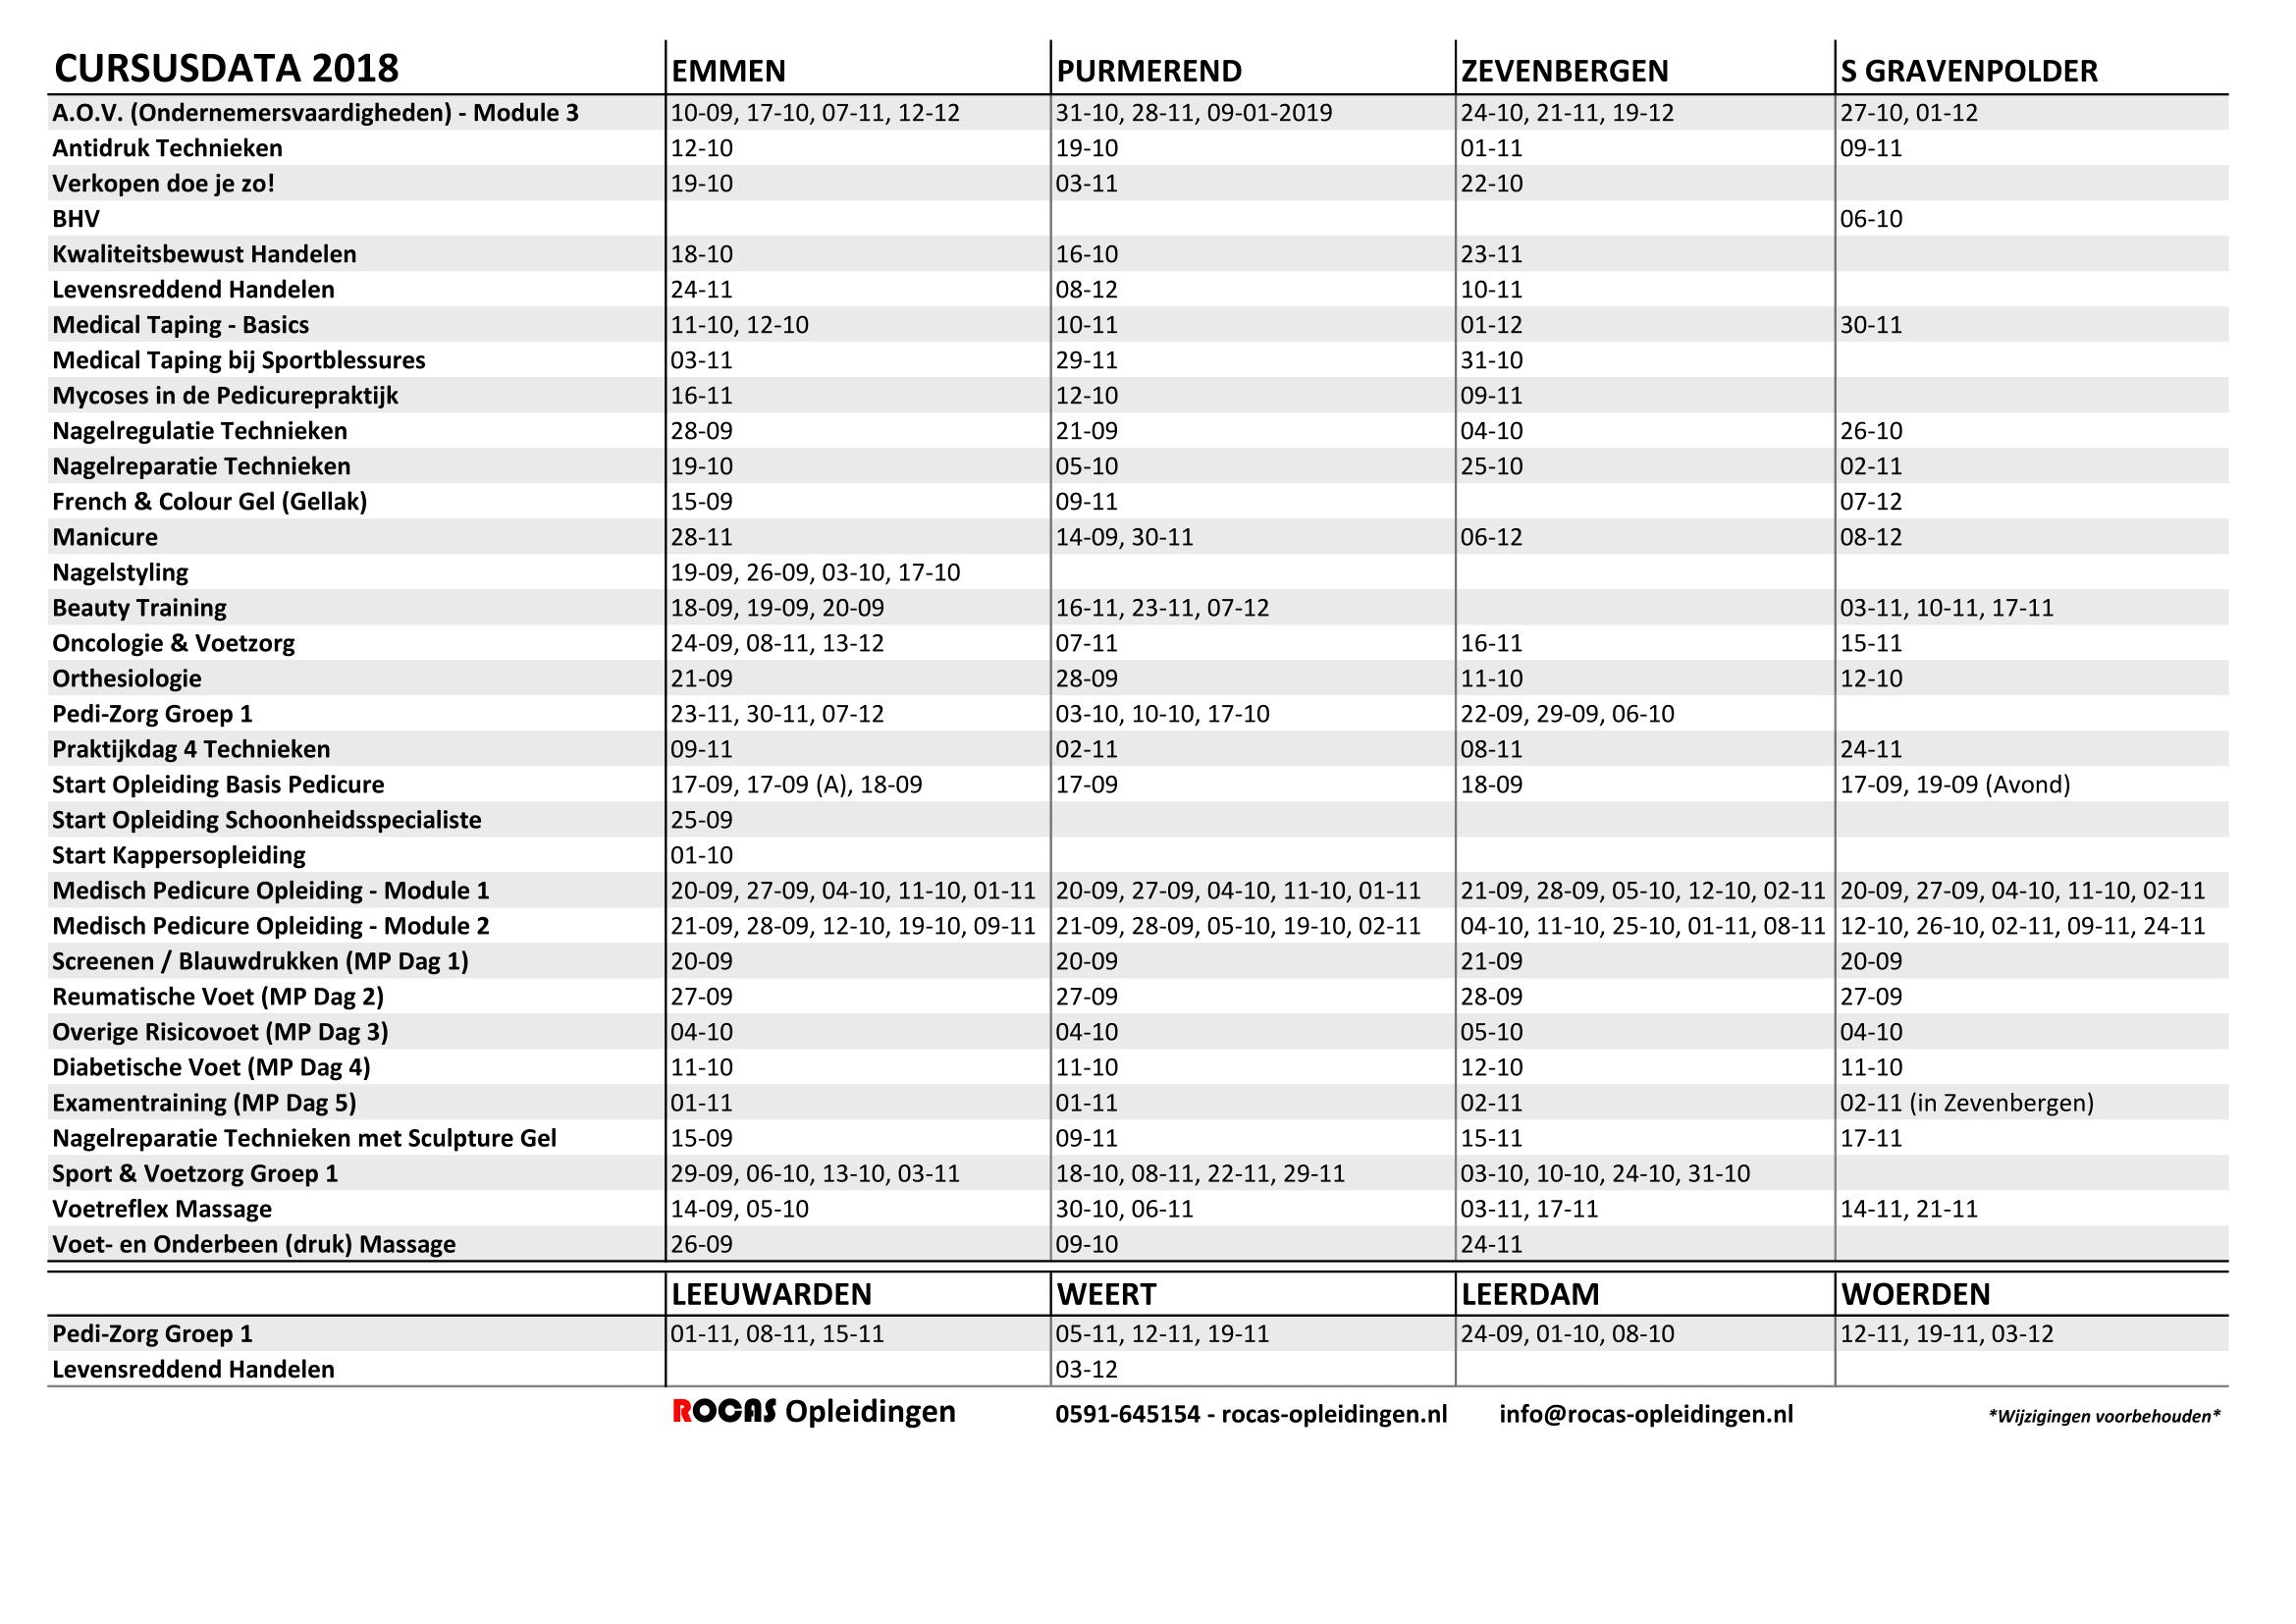 Cursusdata 2018 najaar